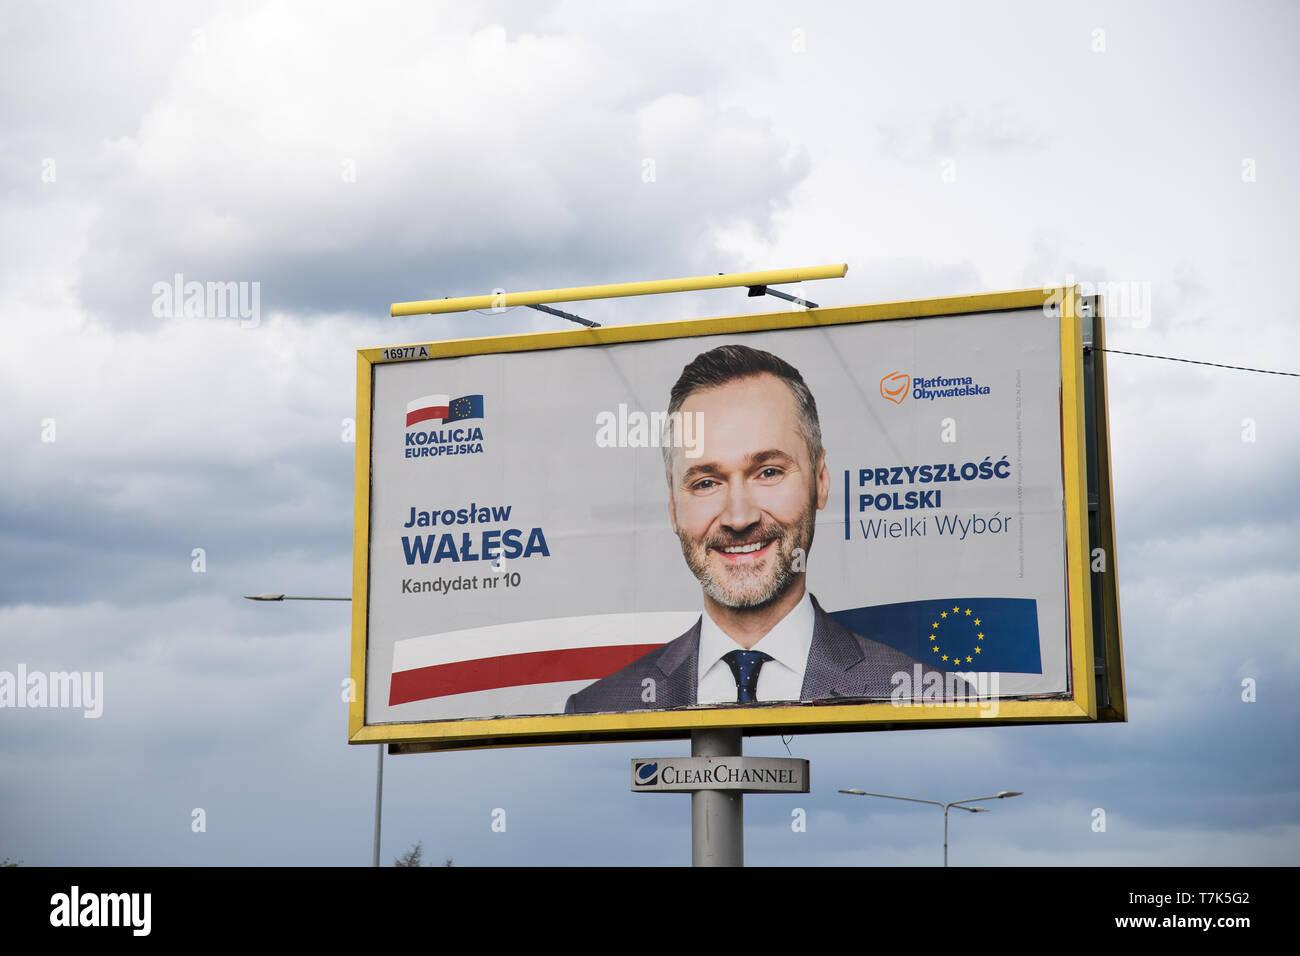 Jaroslaw Walesa's bilboard, candidate of Koalicja Europejska (European Coalition) in 2019 European Parliament election campaign. Gdansk, Poland. May 4 - Stock Image